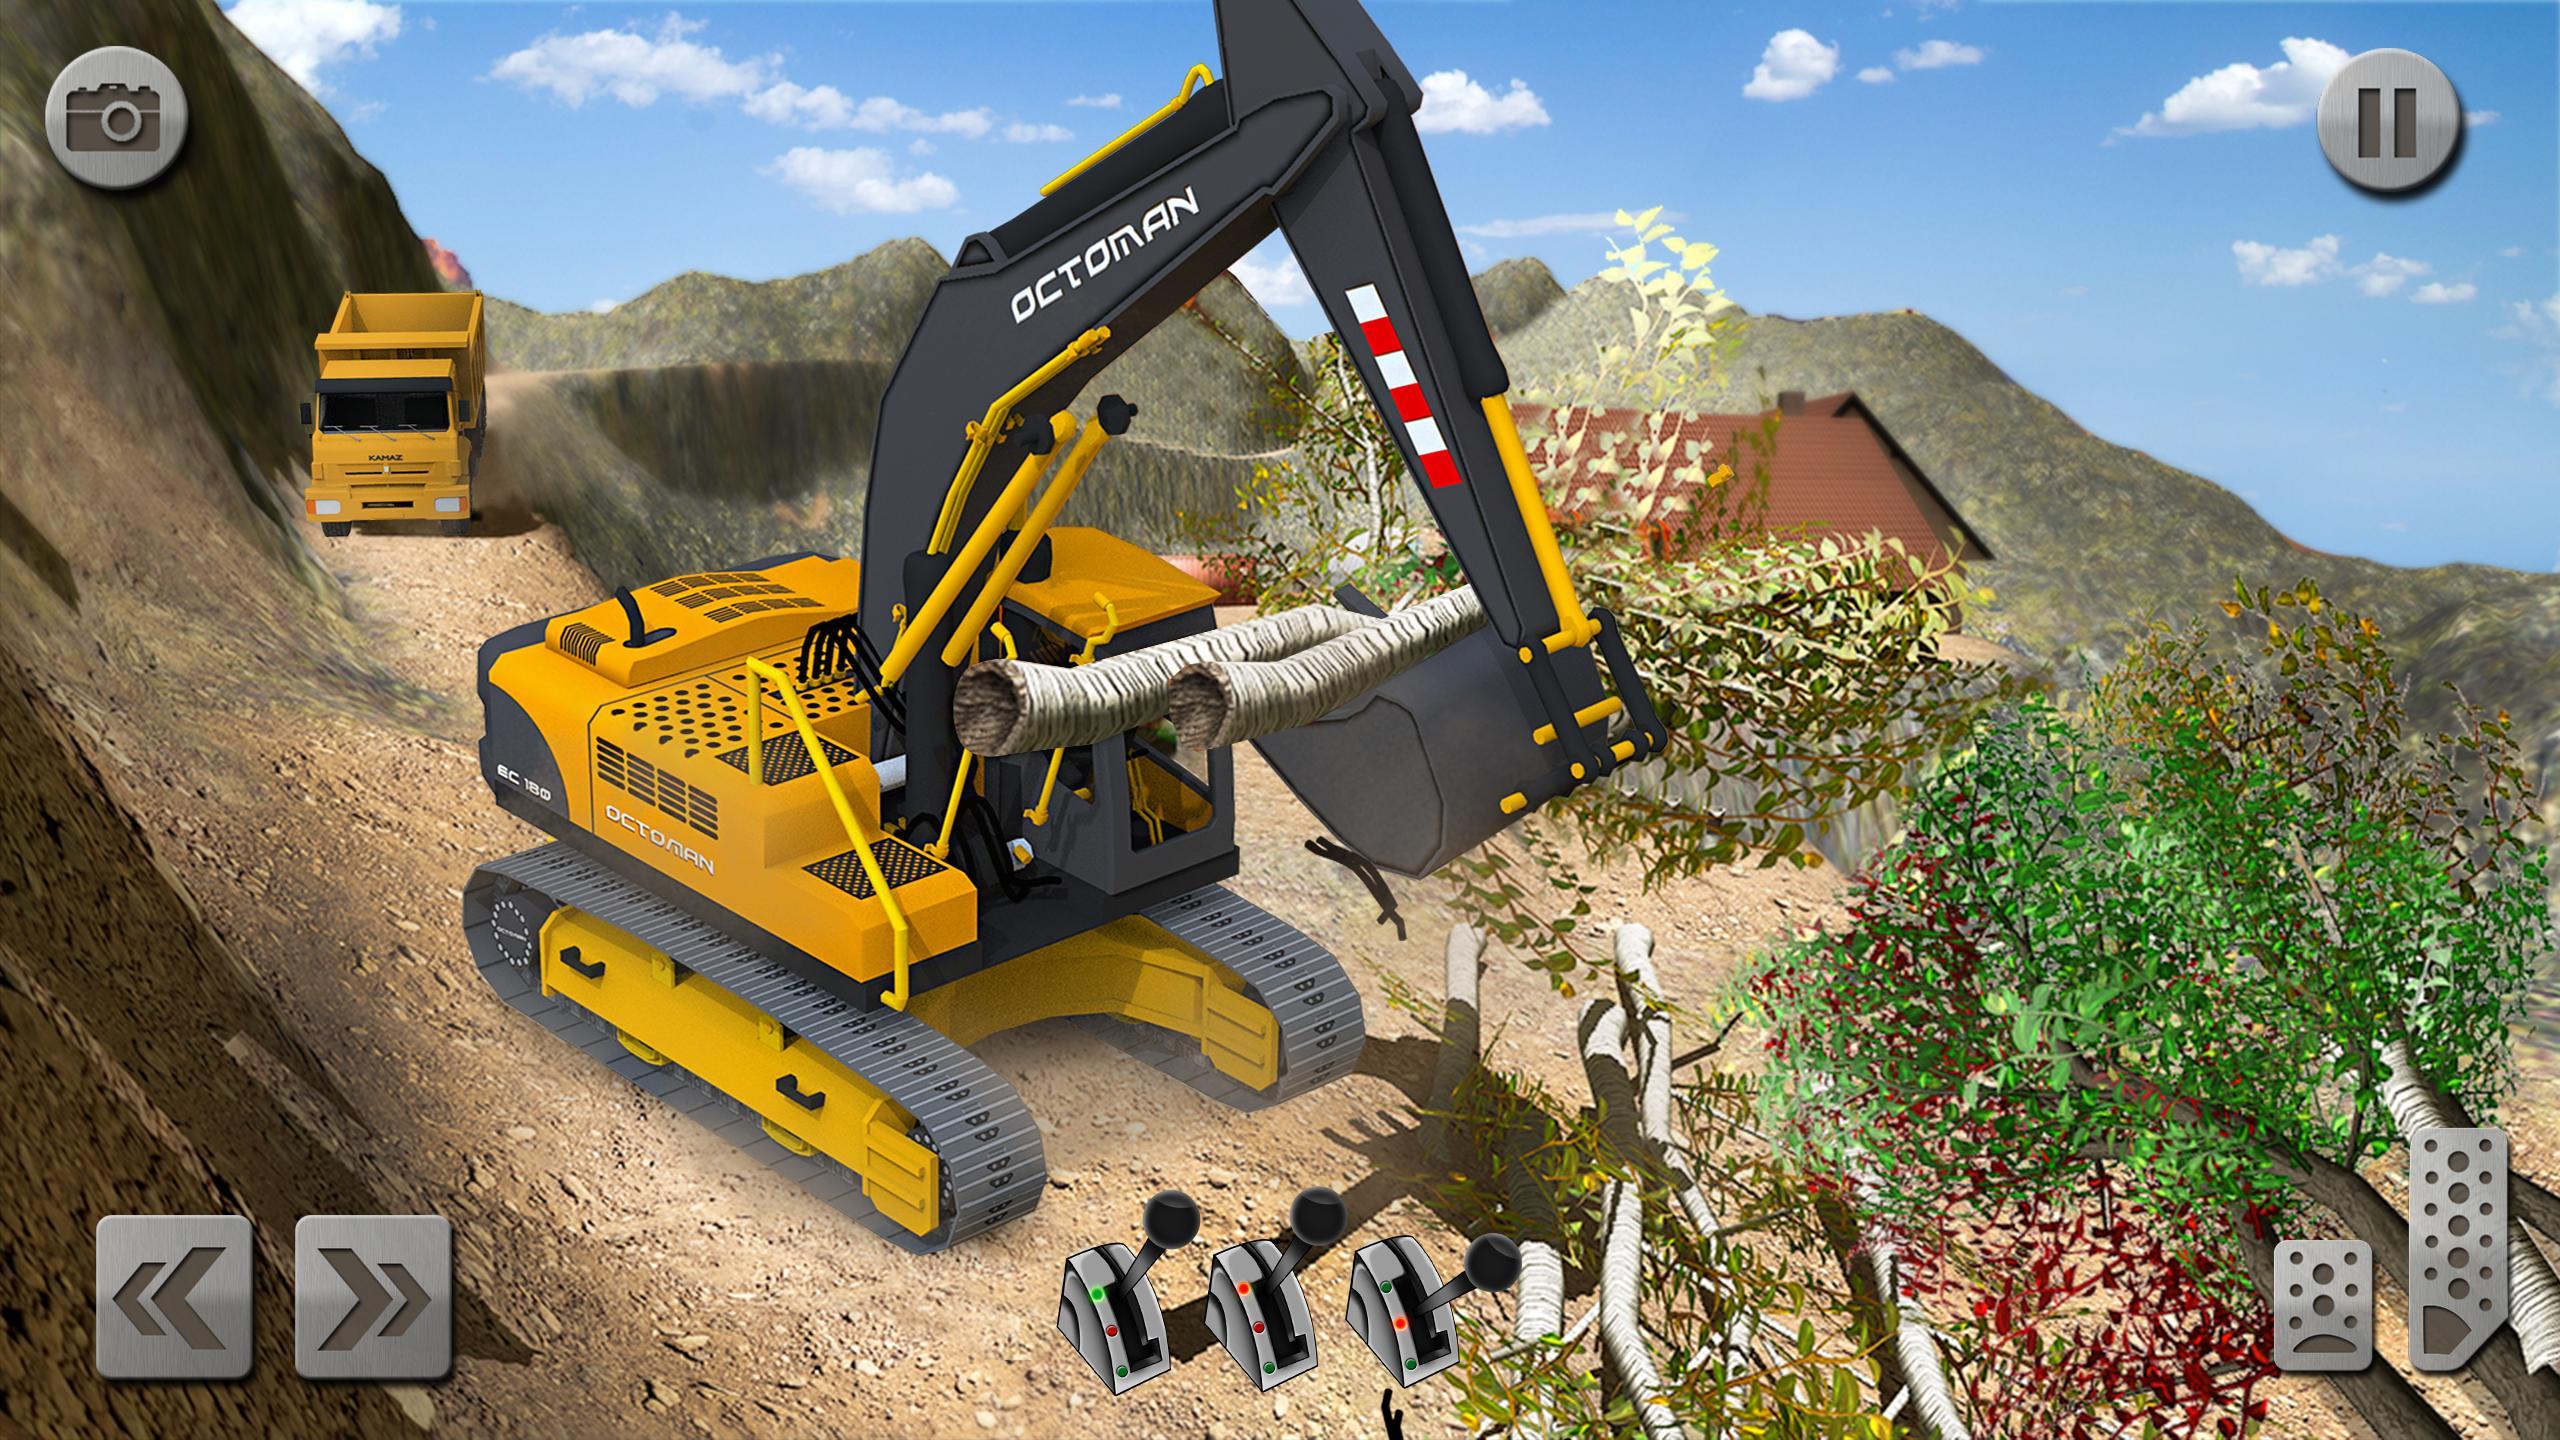 Sand Excavator Truck Driving Rescue Simulator game 5.2 Screenshot 22